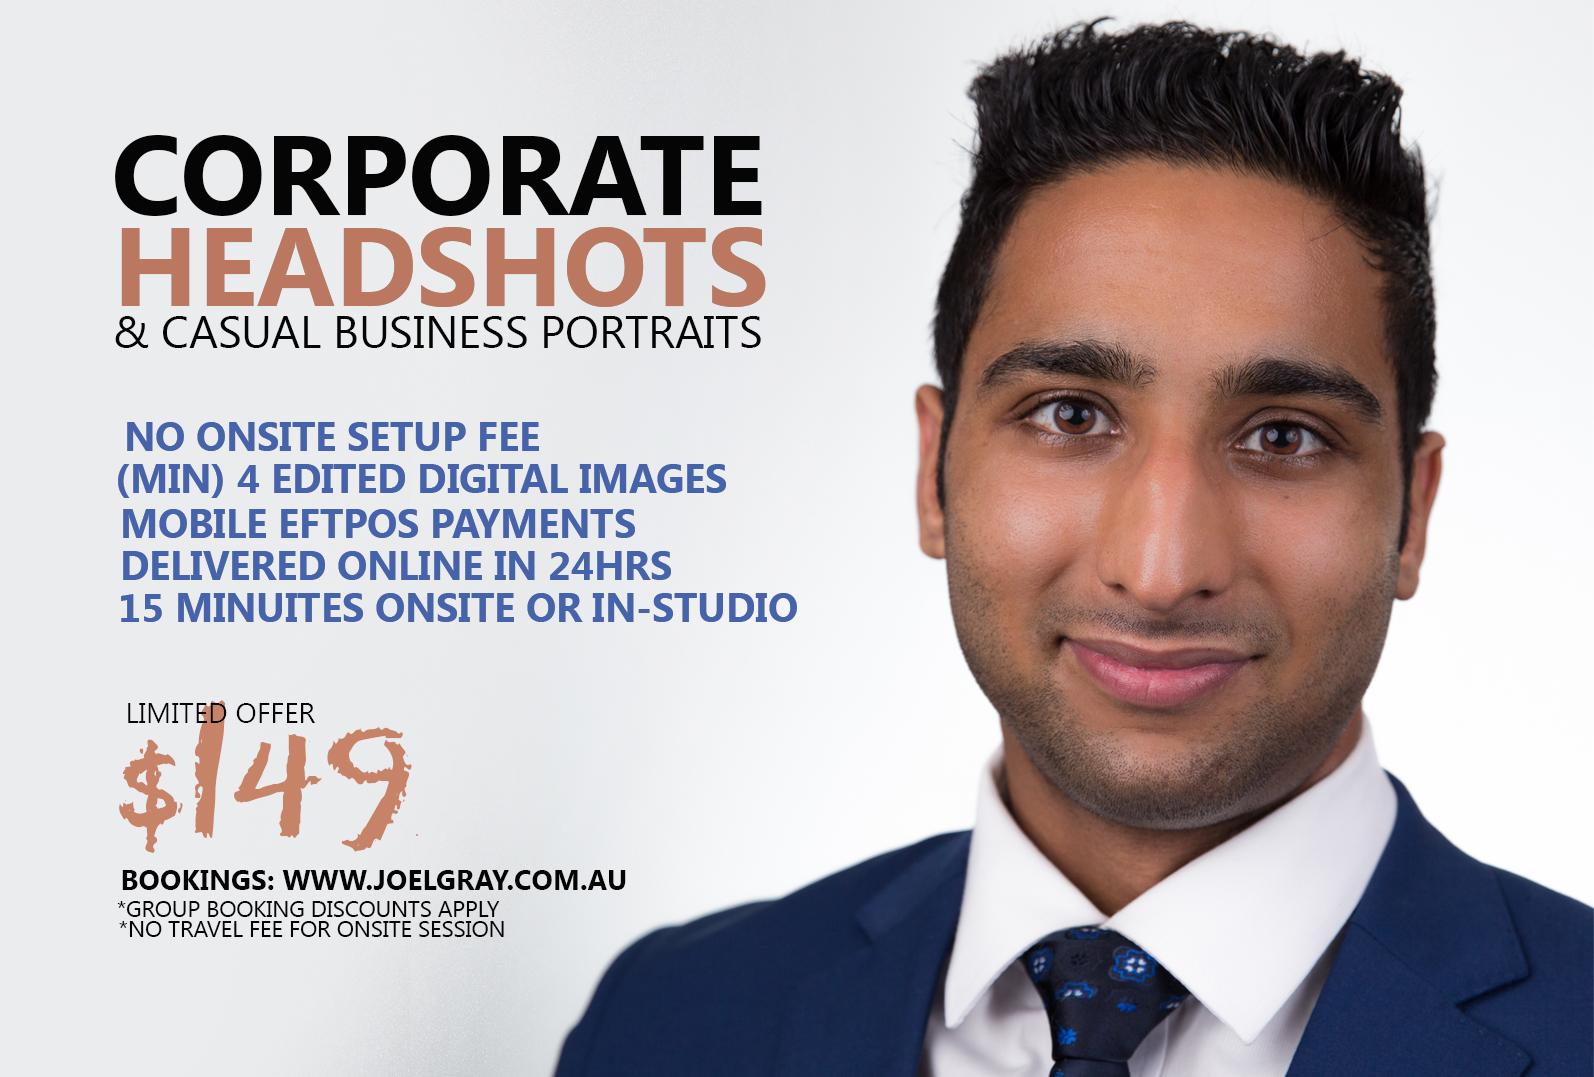 sydney-corporate-headshot-business-portrait-photographer-1800829994